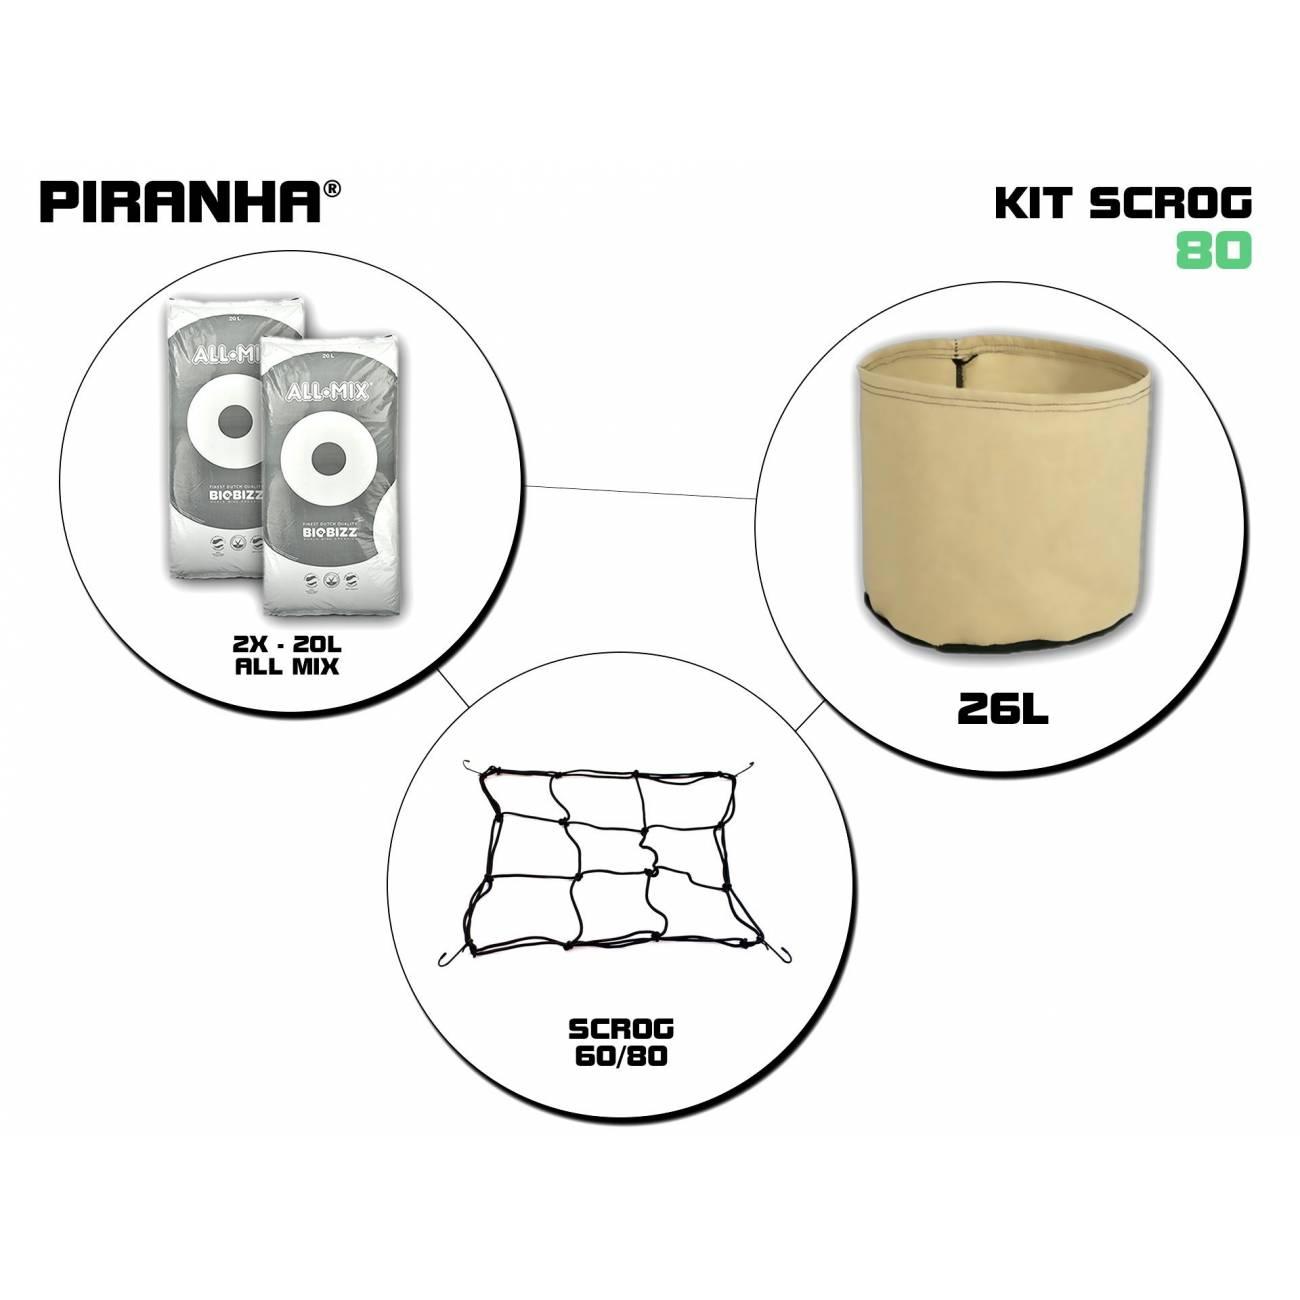 Kit SCROG 80